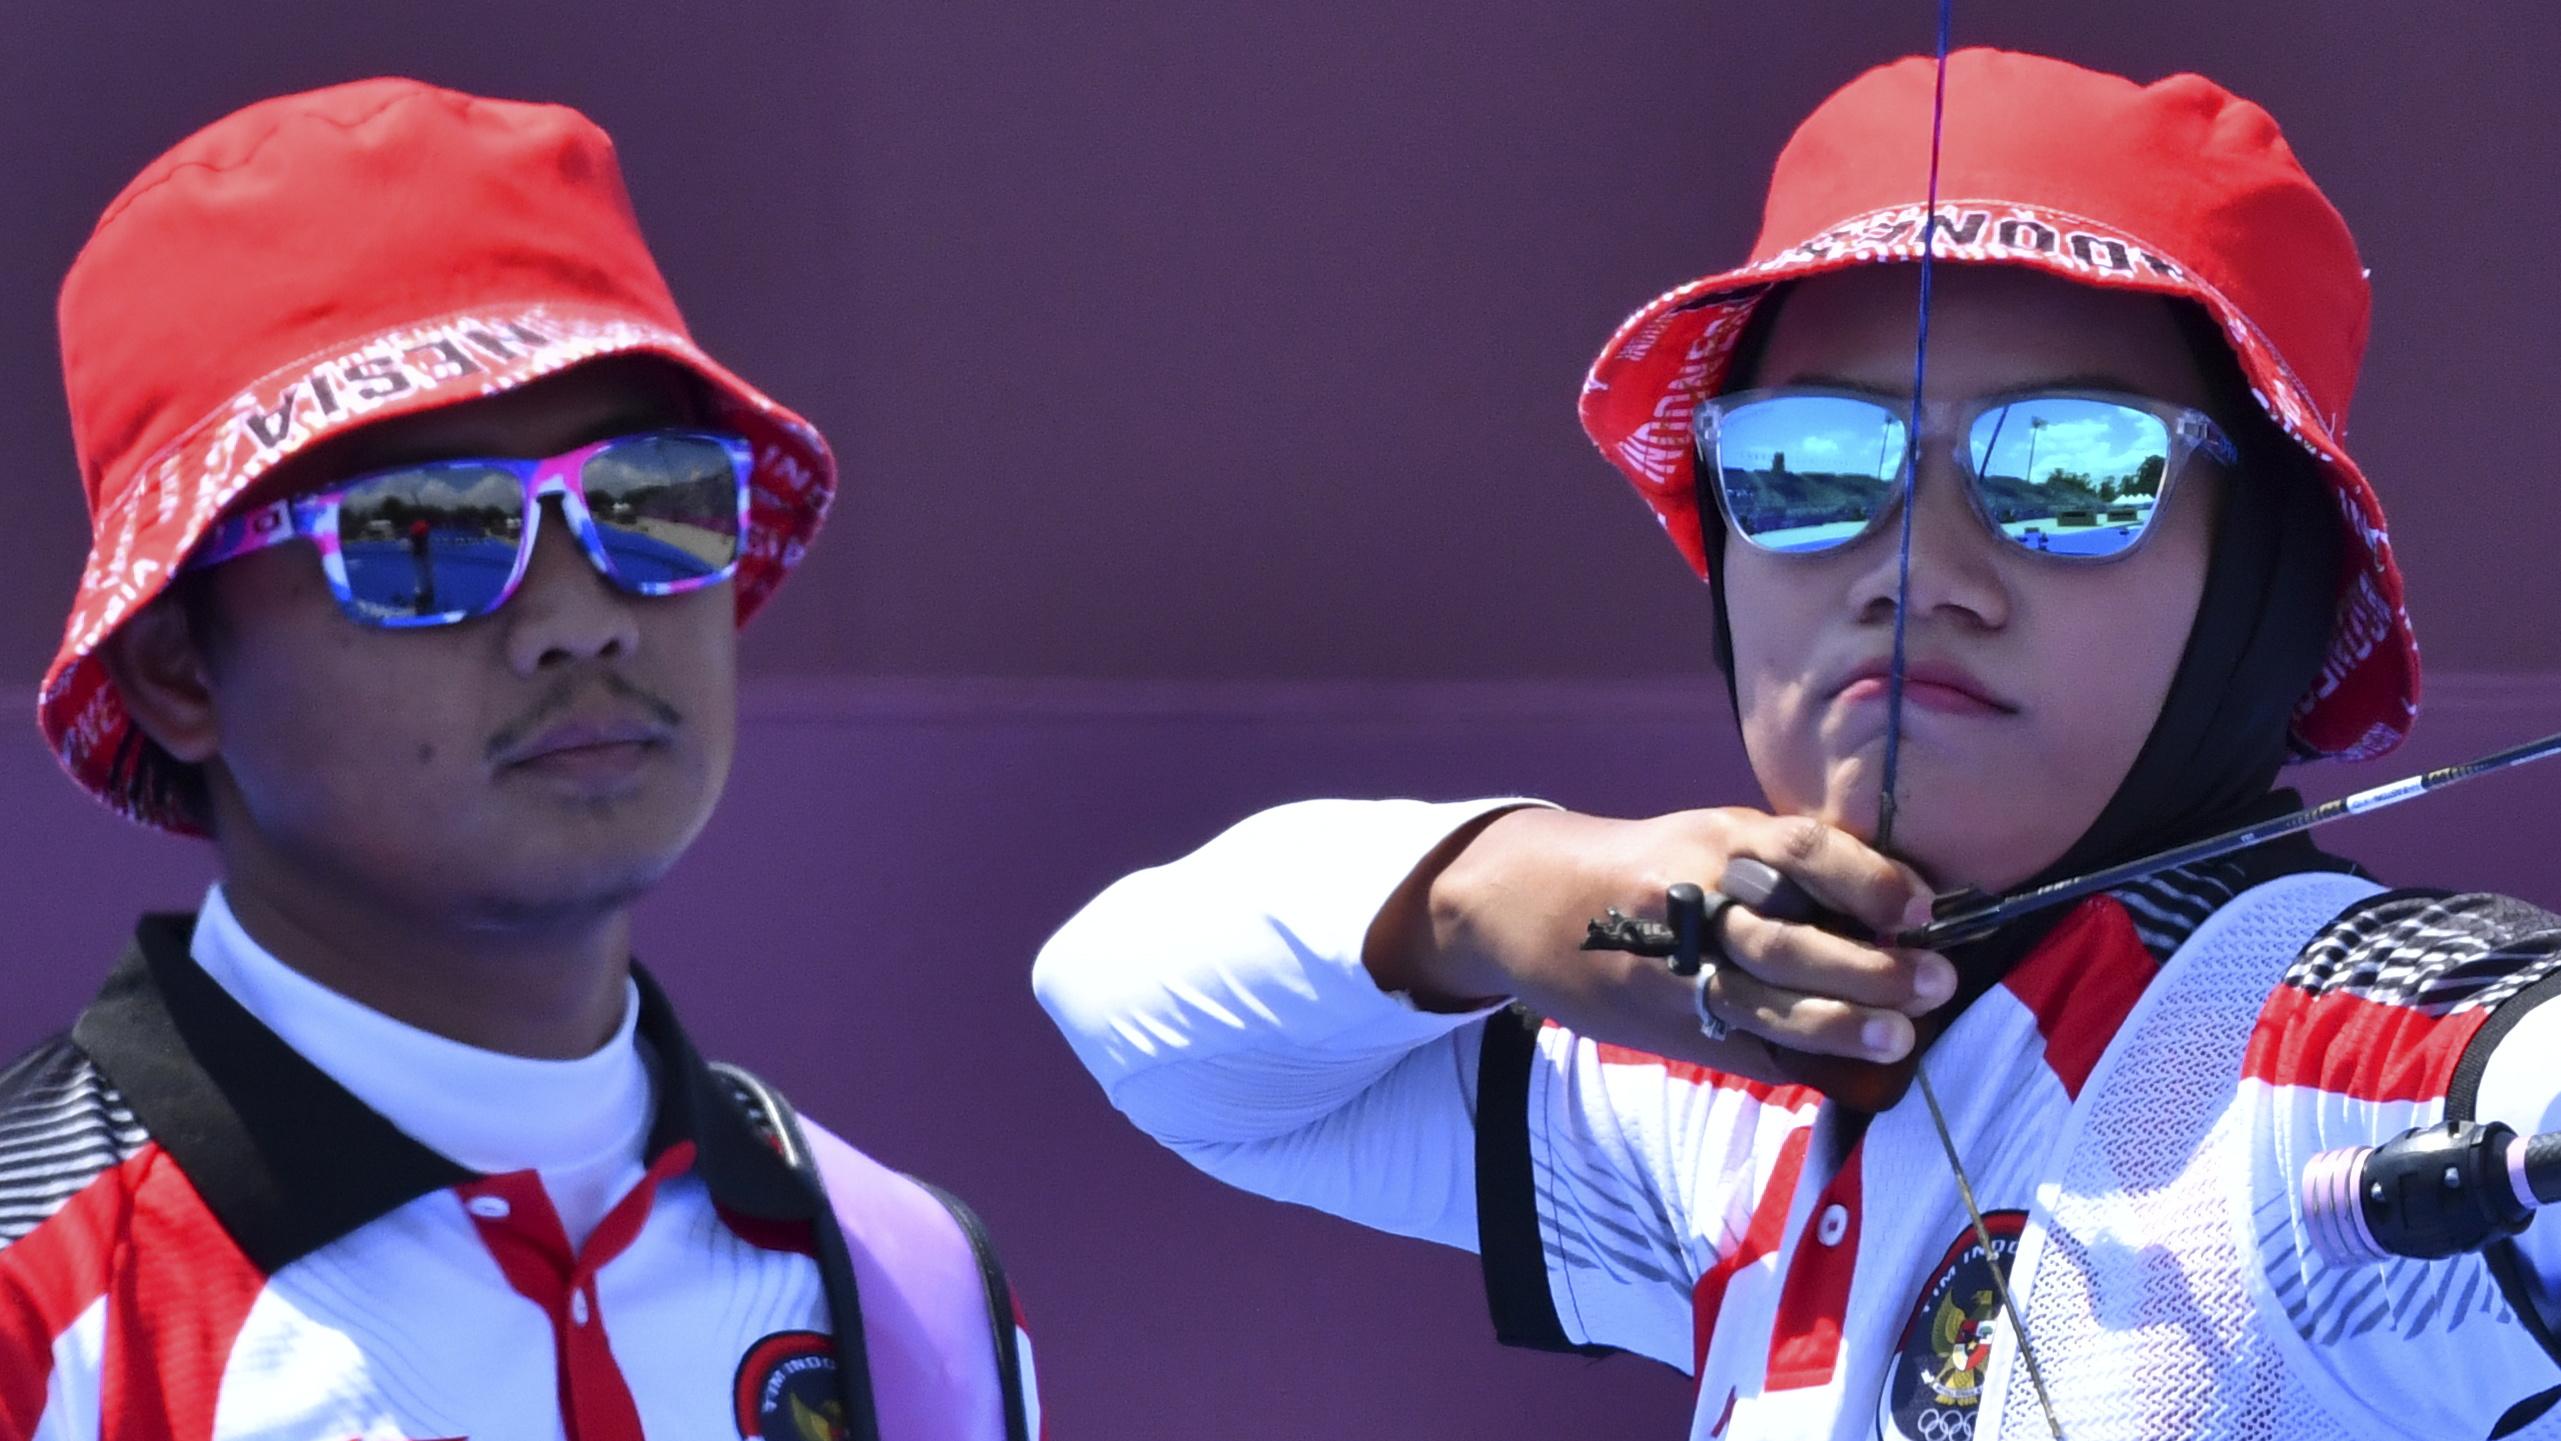 Tokyo 2020 Olympics - Archery - Mixed Team - 1/8 Finals - Yumenoshima Archery Field, Tokyo, Japan - July 24, 2021. Diananda Choirunisa of Indonesia and Agata Riau Ega Salsabilla of Indonesia during competition REUTERS/Clodagh Kilcoyne